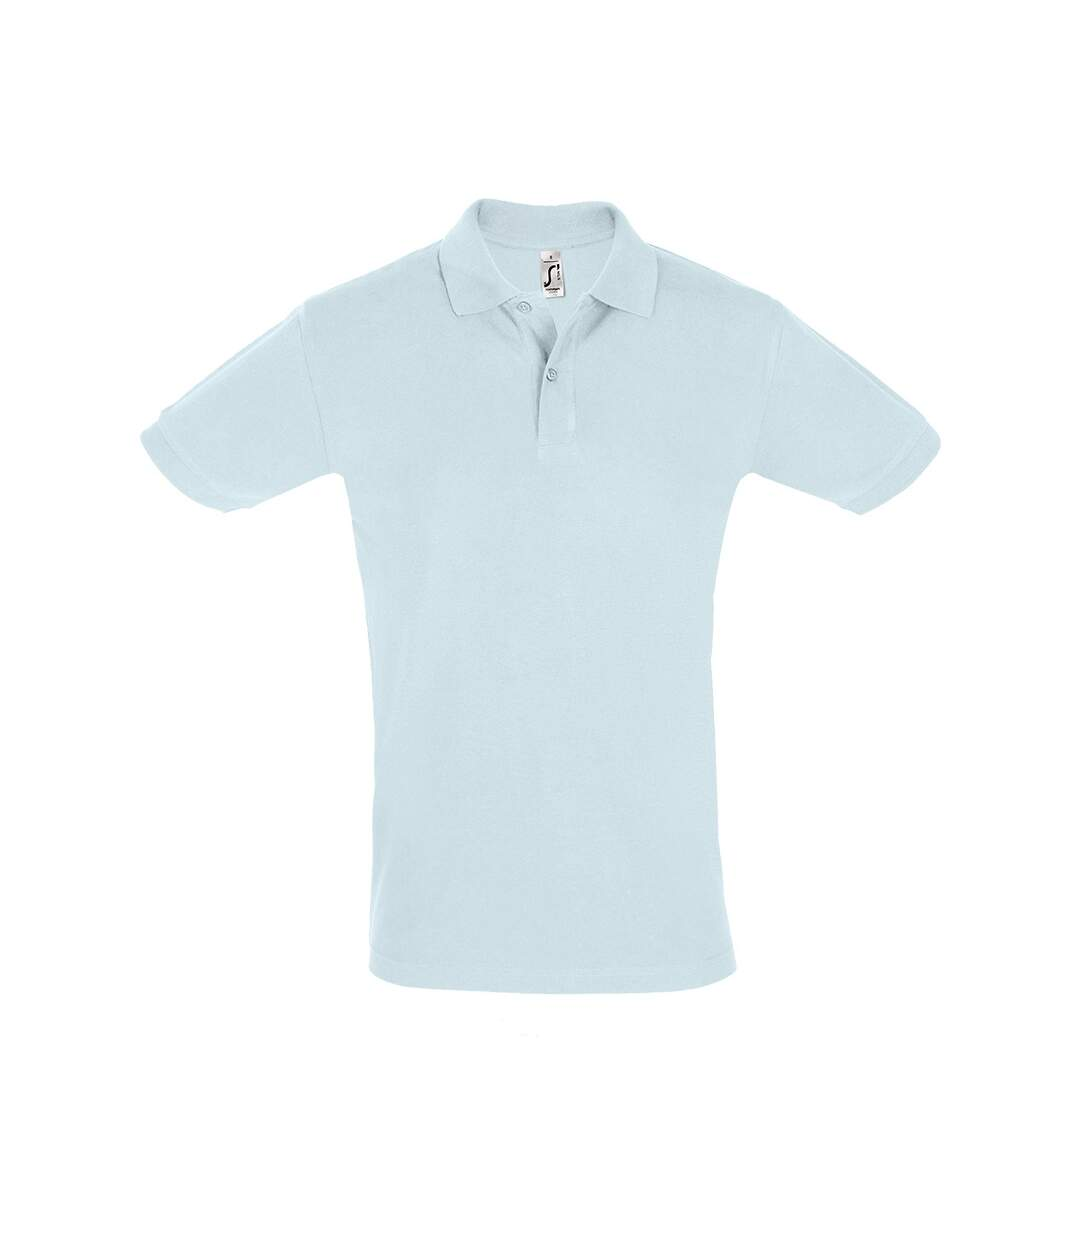 SOLS Mens Perfect Pique Short Sleeve Polo Shirt (Creamy Blue) - UTPC283